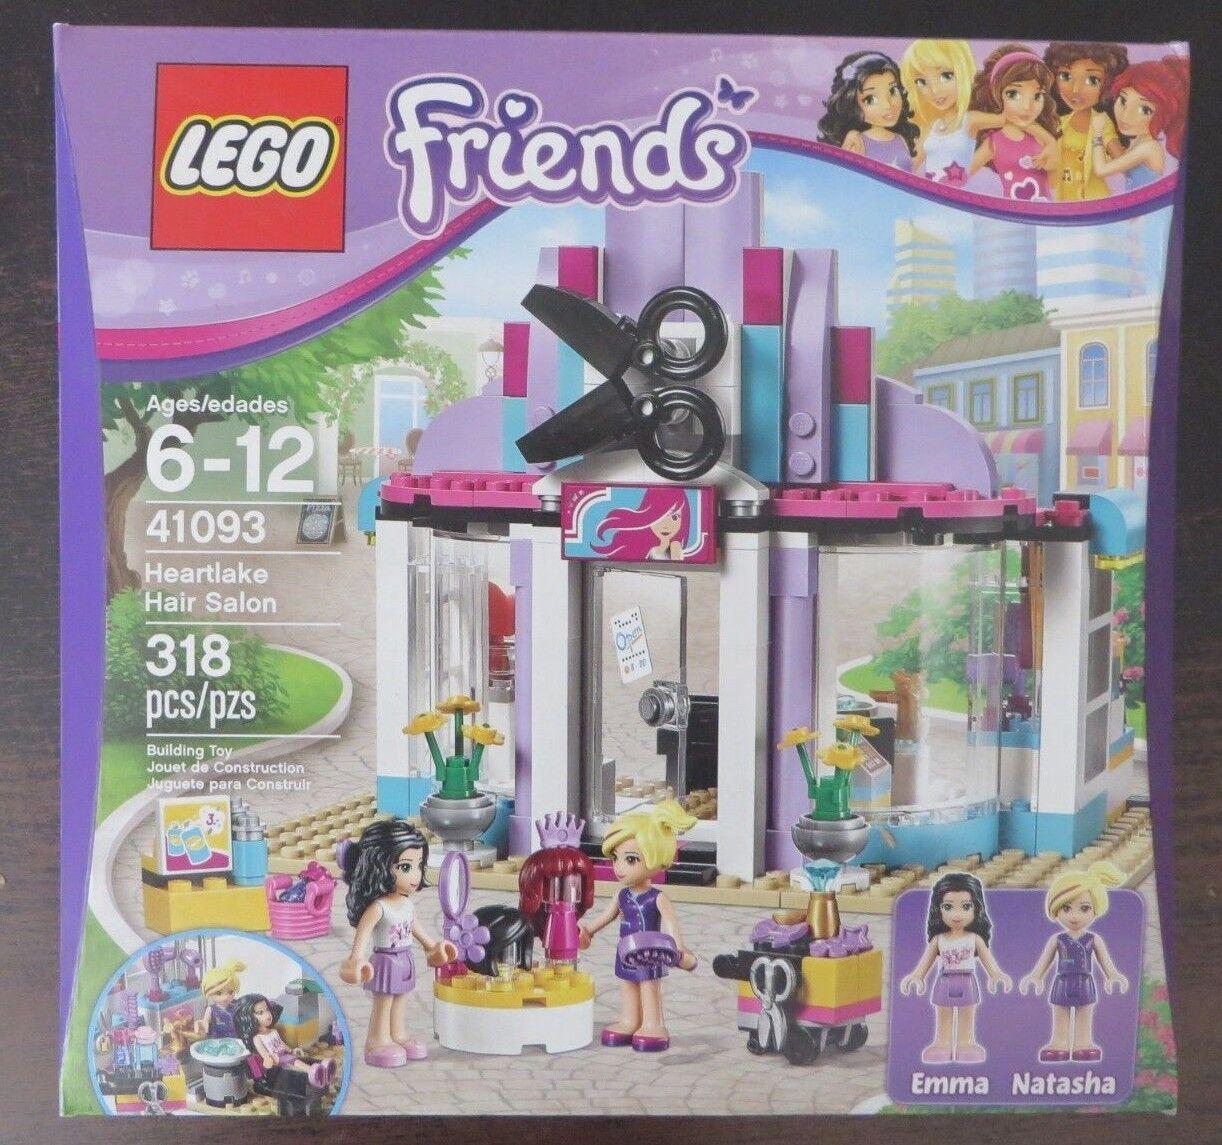 Lego 41093 - Friends - Heartlake Hair Salon -  Retired - NISB